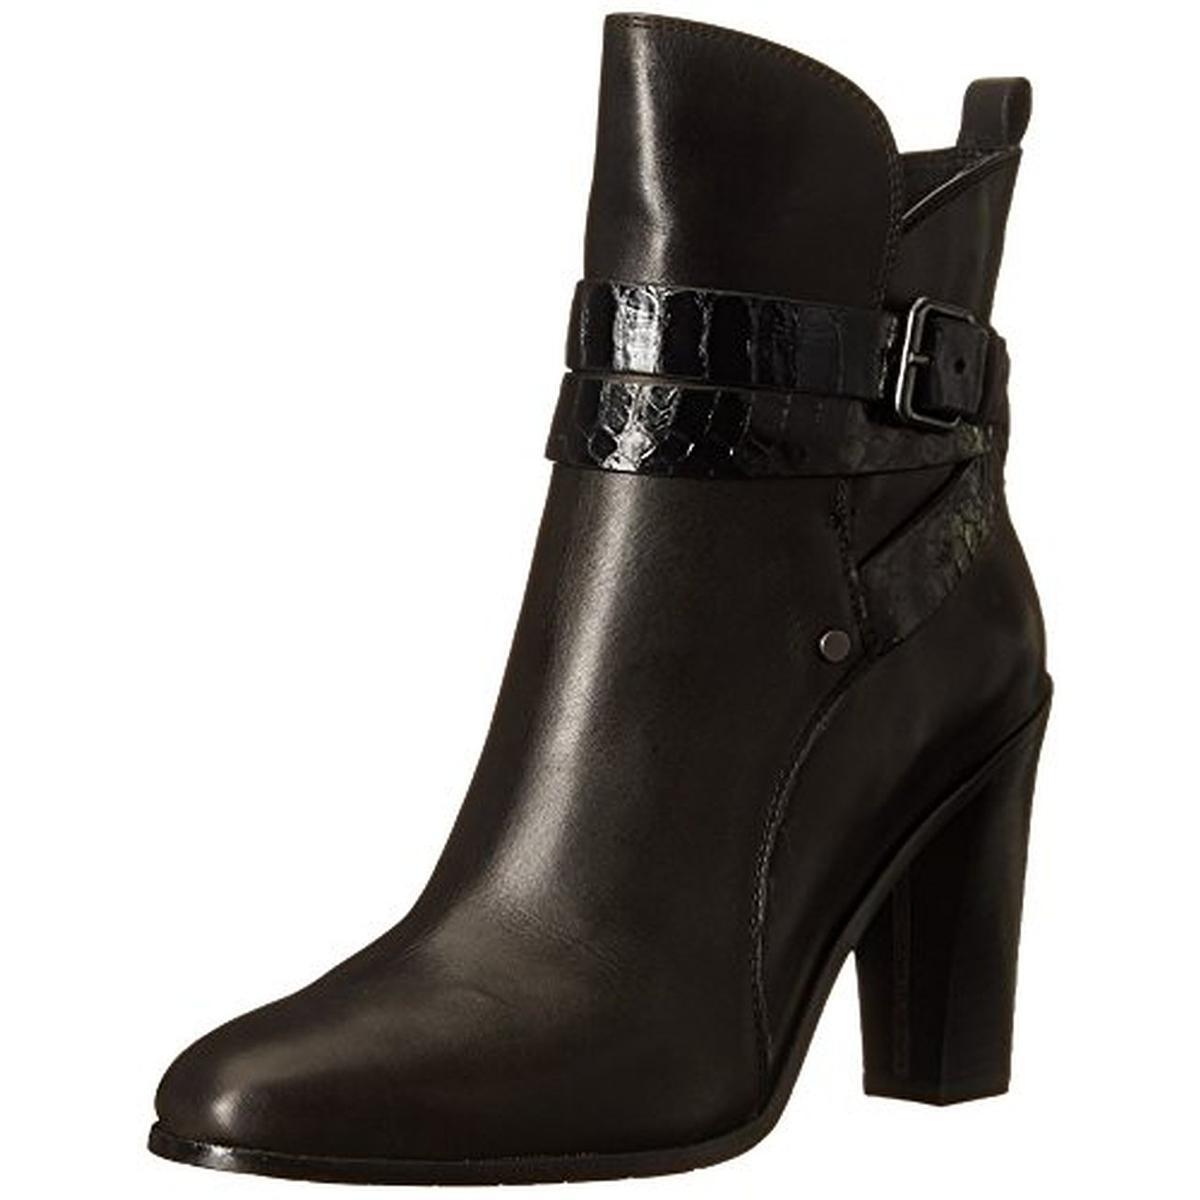 Donald J Pliner Oli Round Toe Leather Ankle Boot by Donald J Pliner